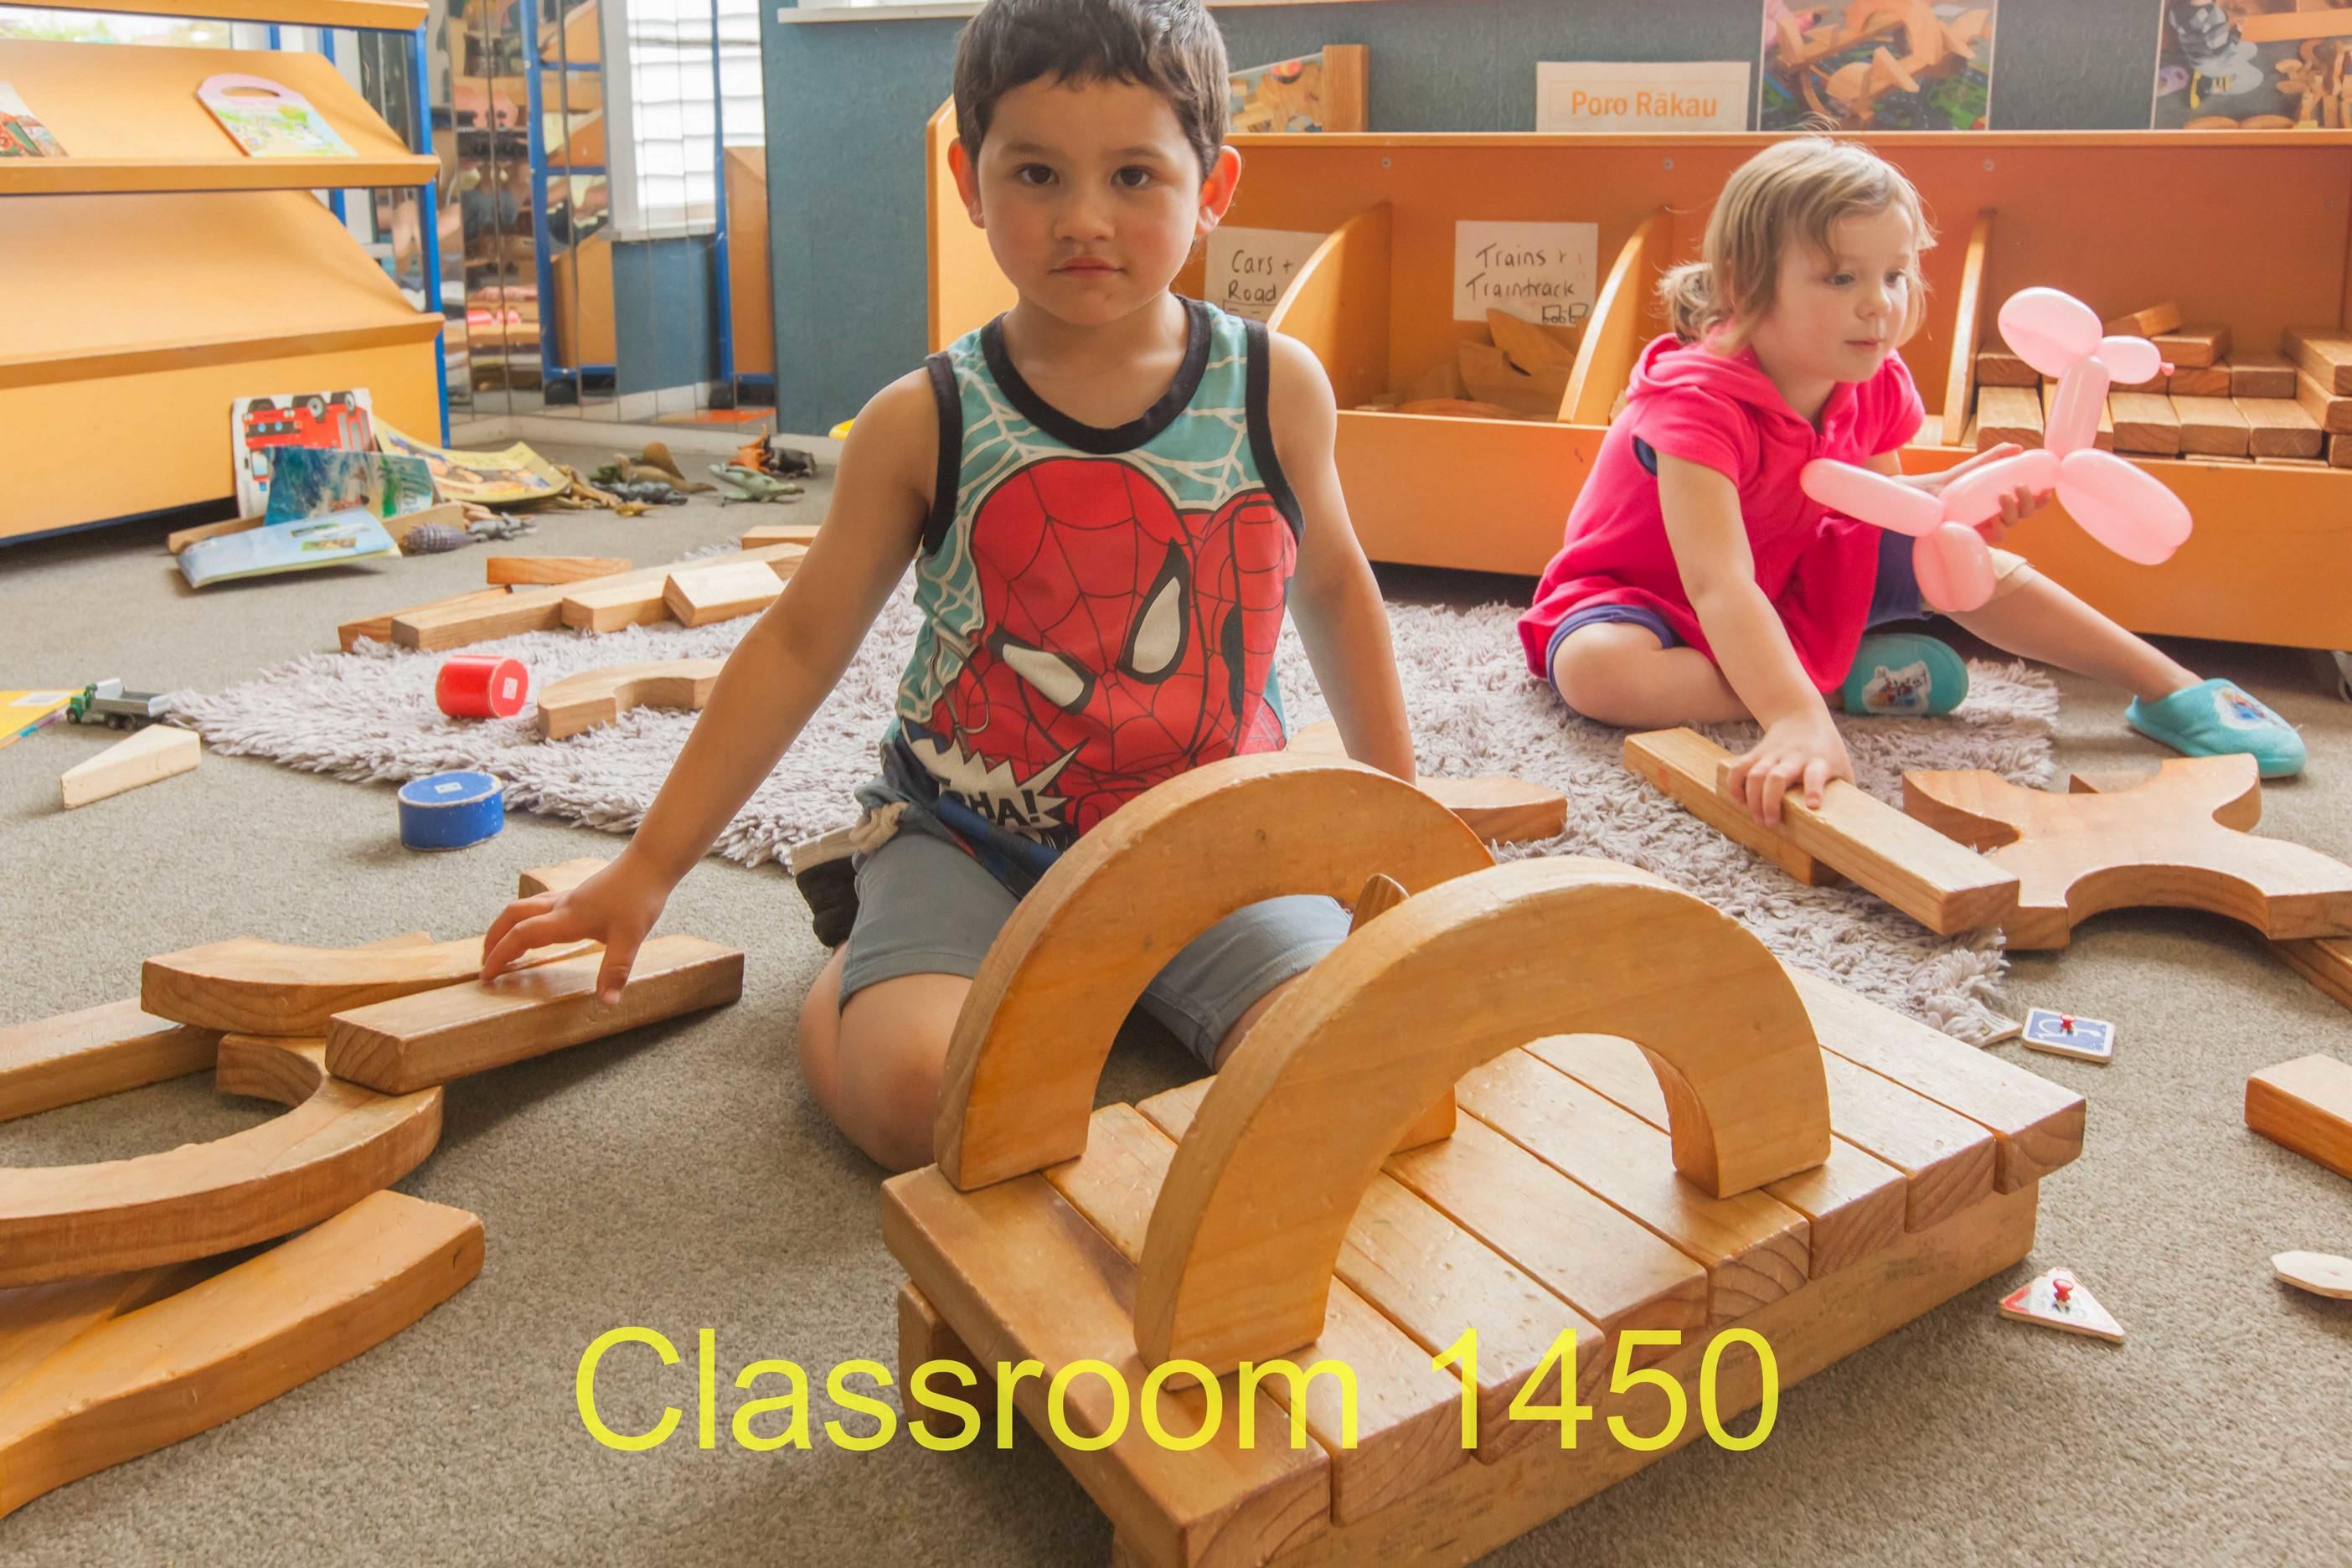 Classroom 1450